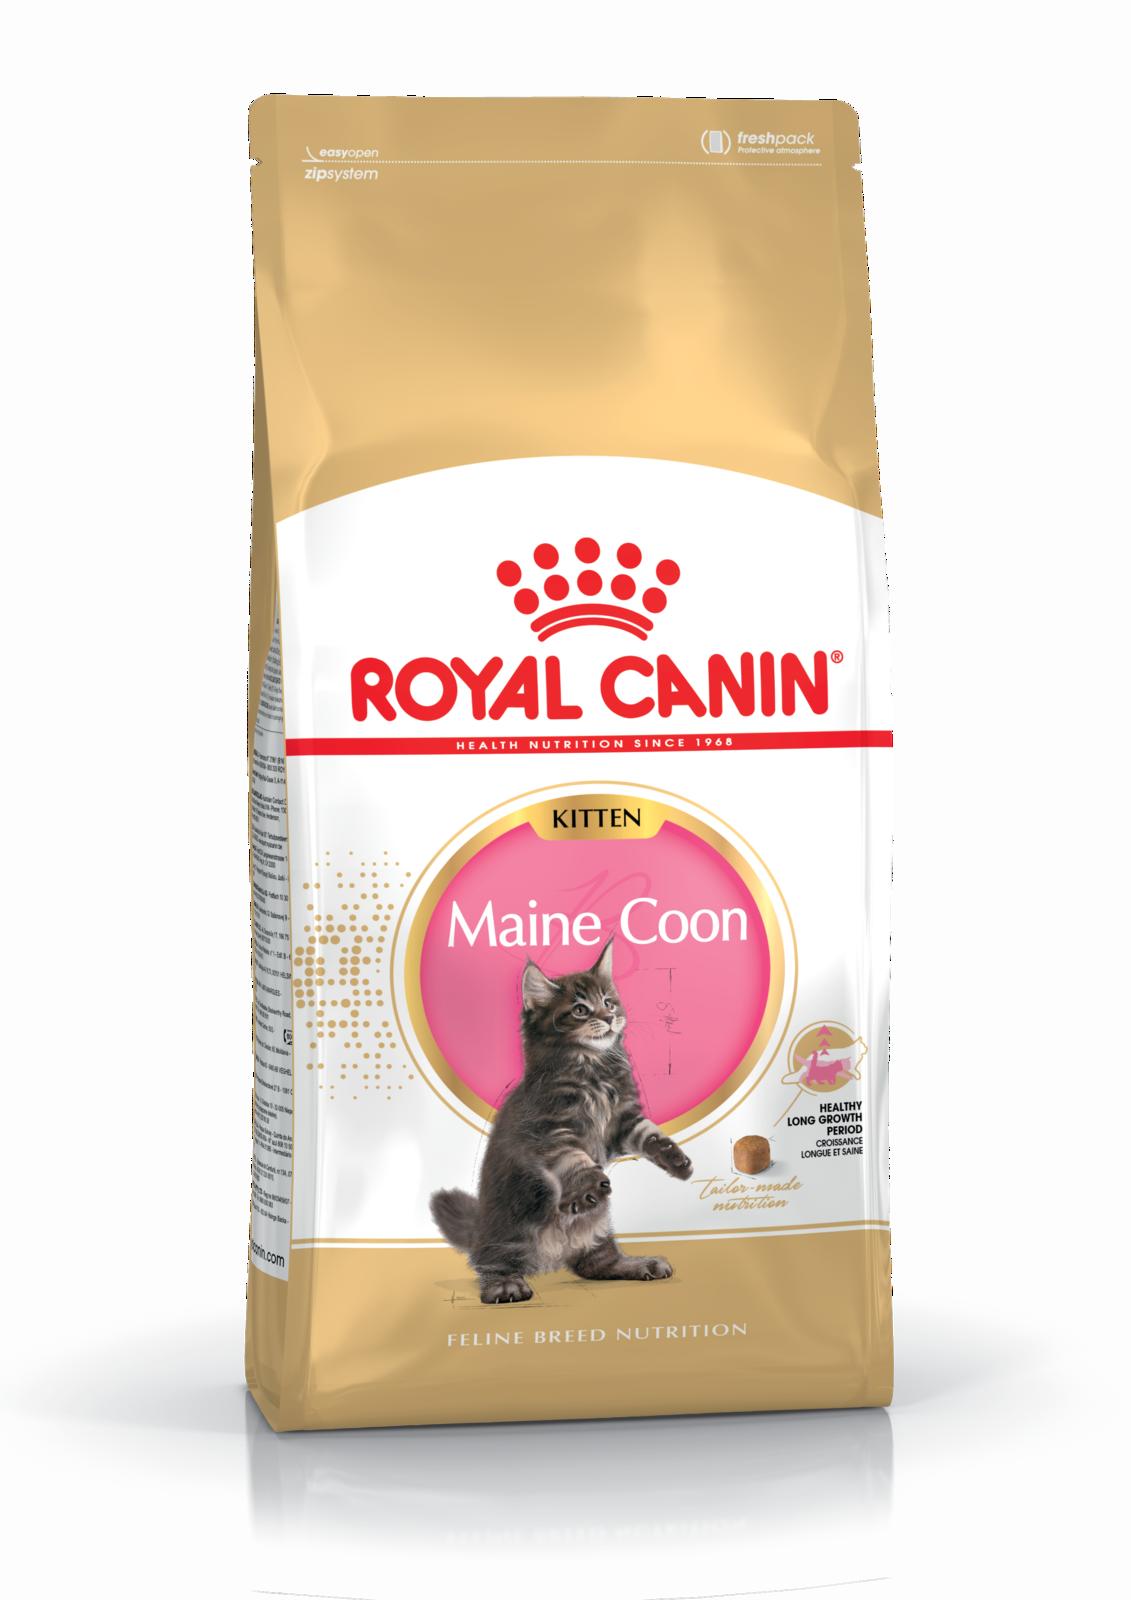 ROYAL CANIN Kitten Maine Coon 10 kg